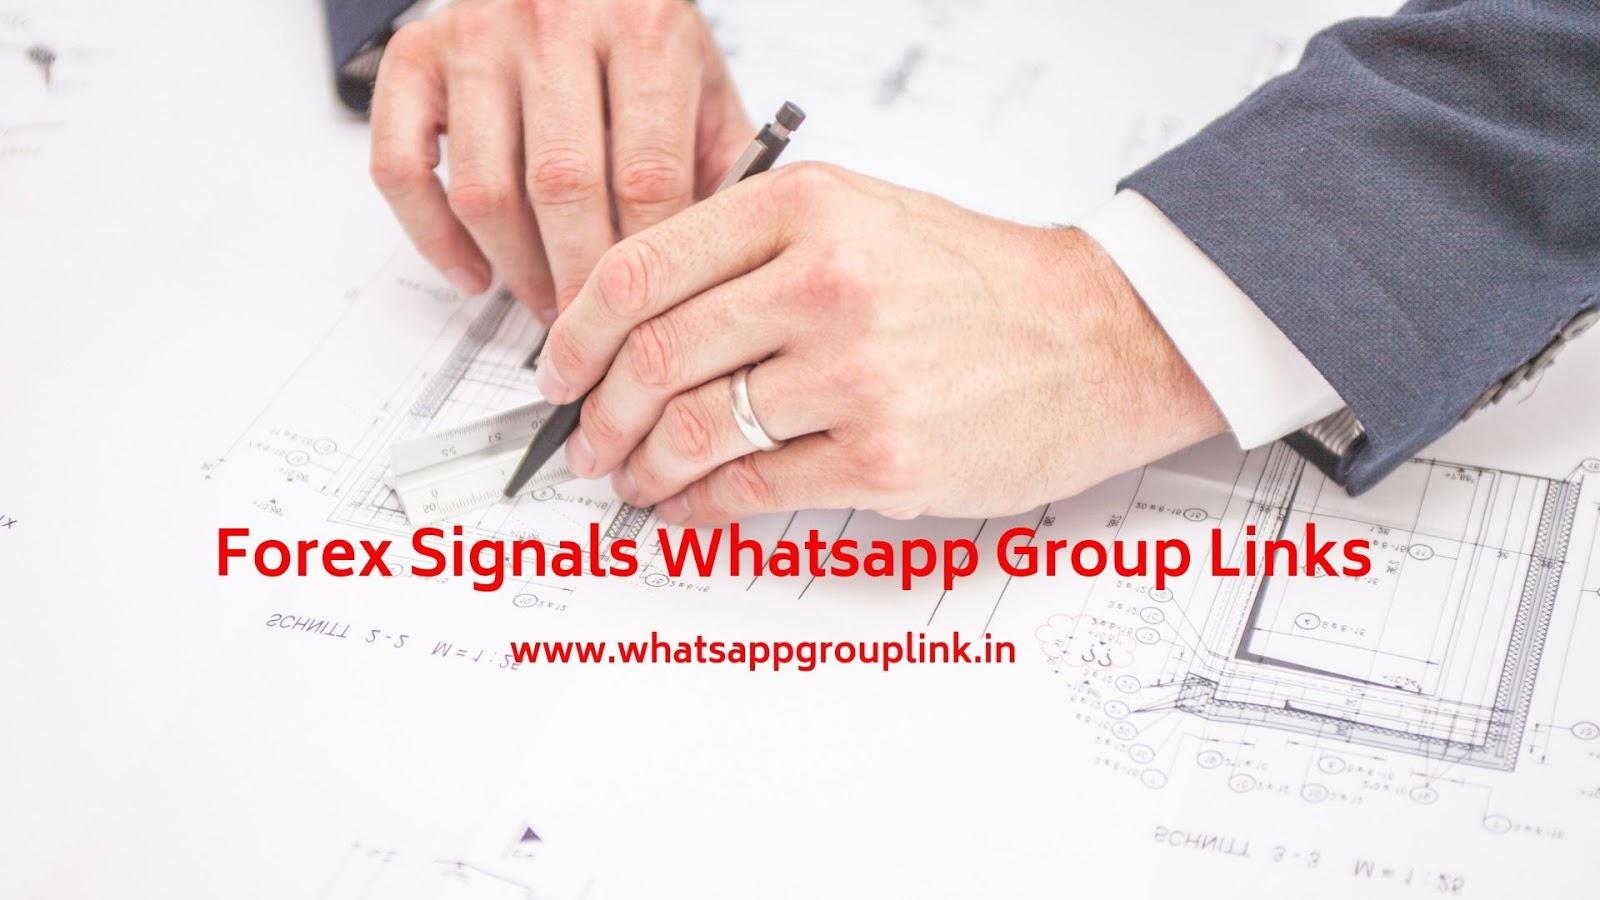 blogger.com – Premium Forex Signals directly to WhatsApp